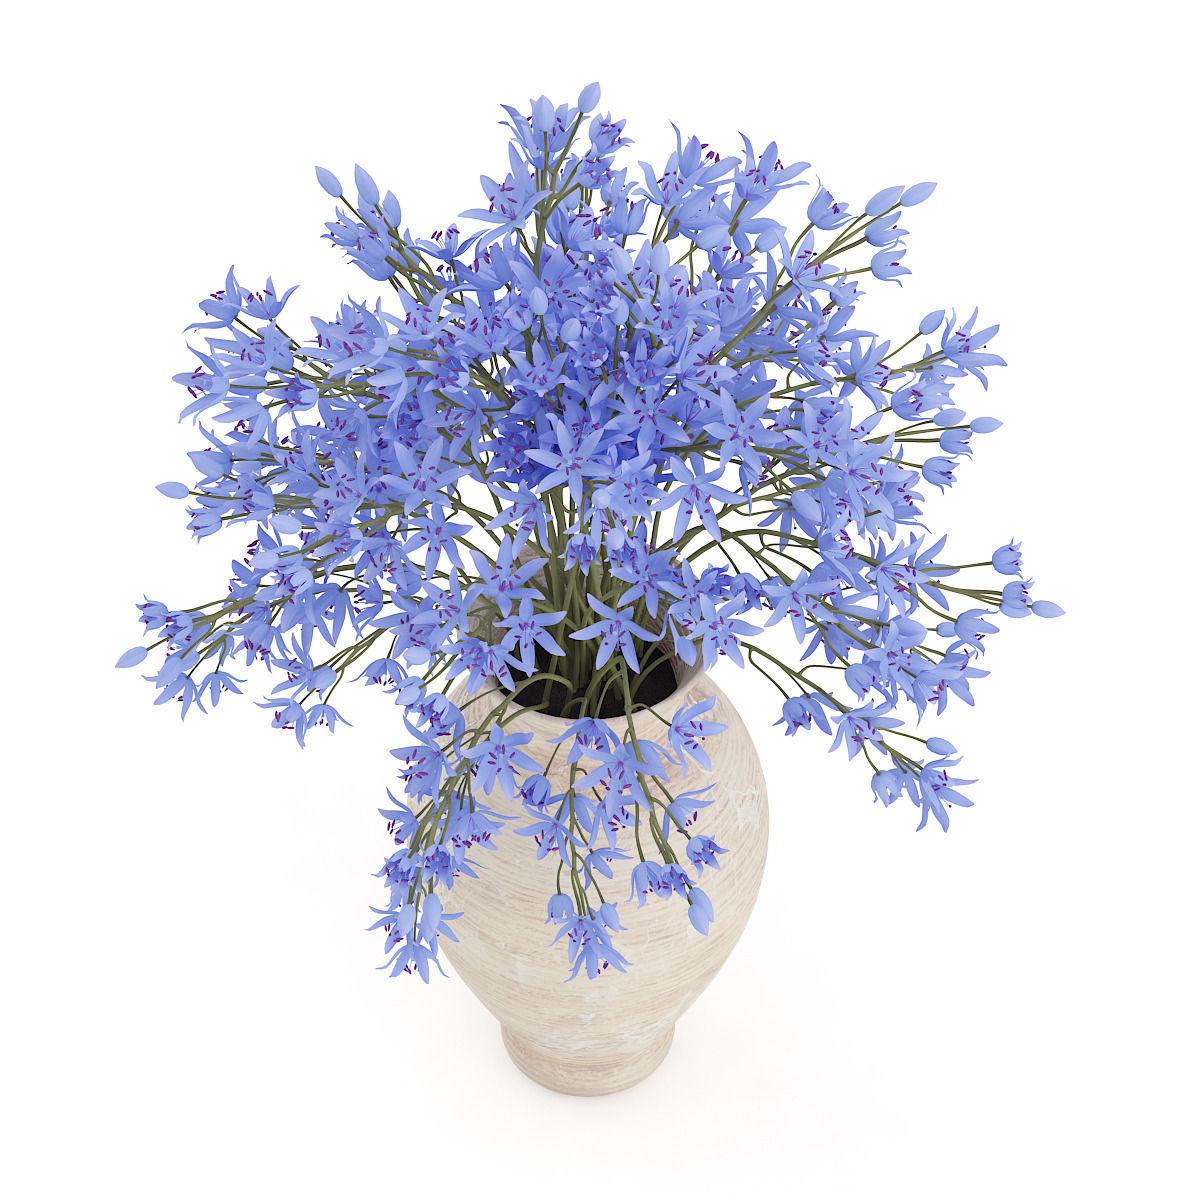 Blue flowers in ceramic vase 3d model cgtrader blue flowers in ceramic vase 3d model max obj fbx c4d mtl 3 reviewsmspy